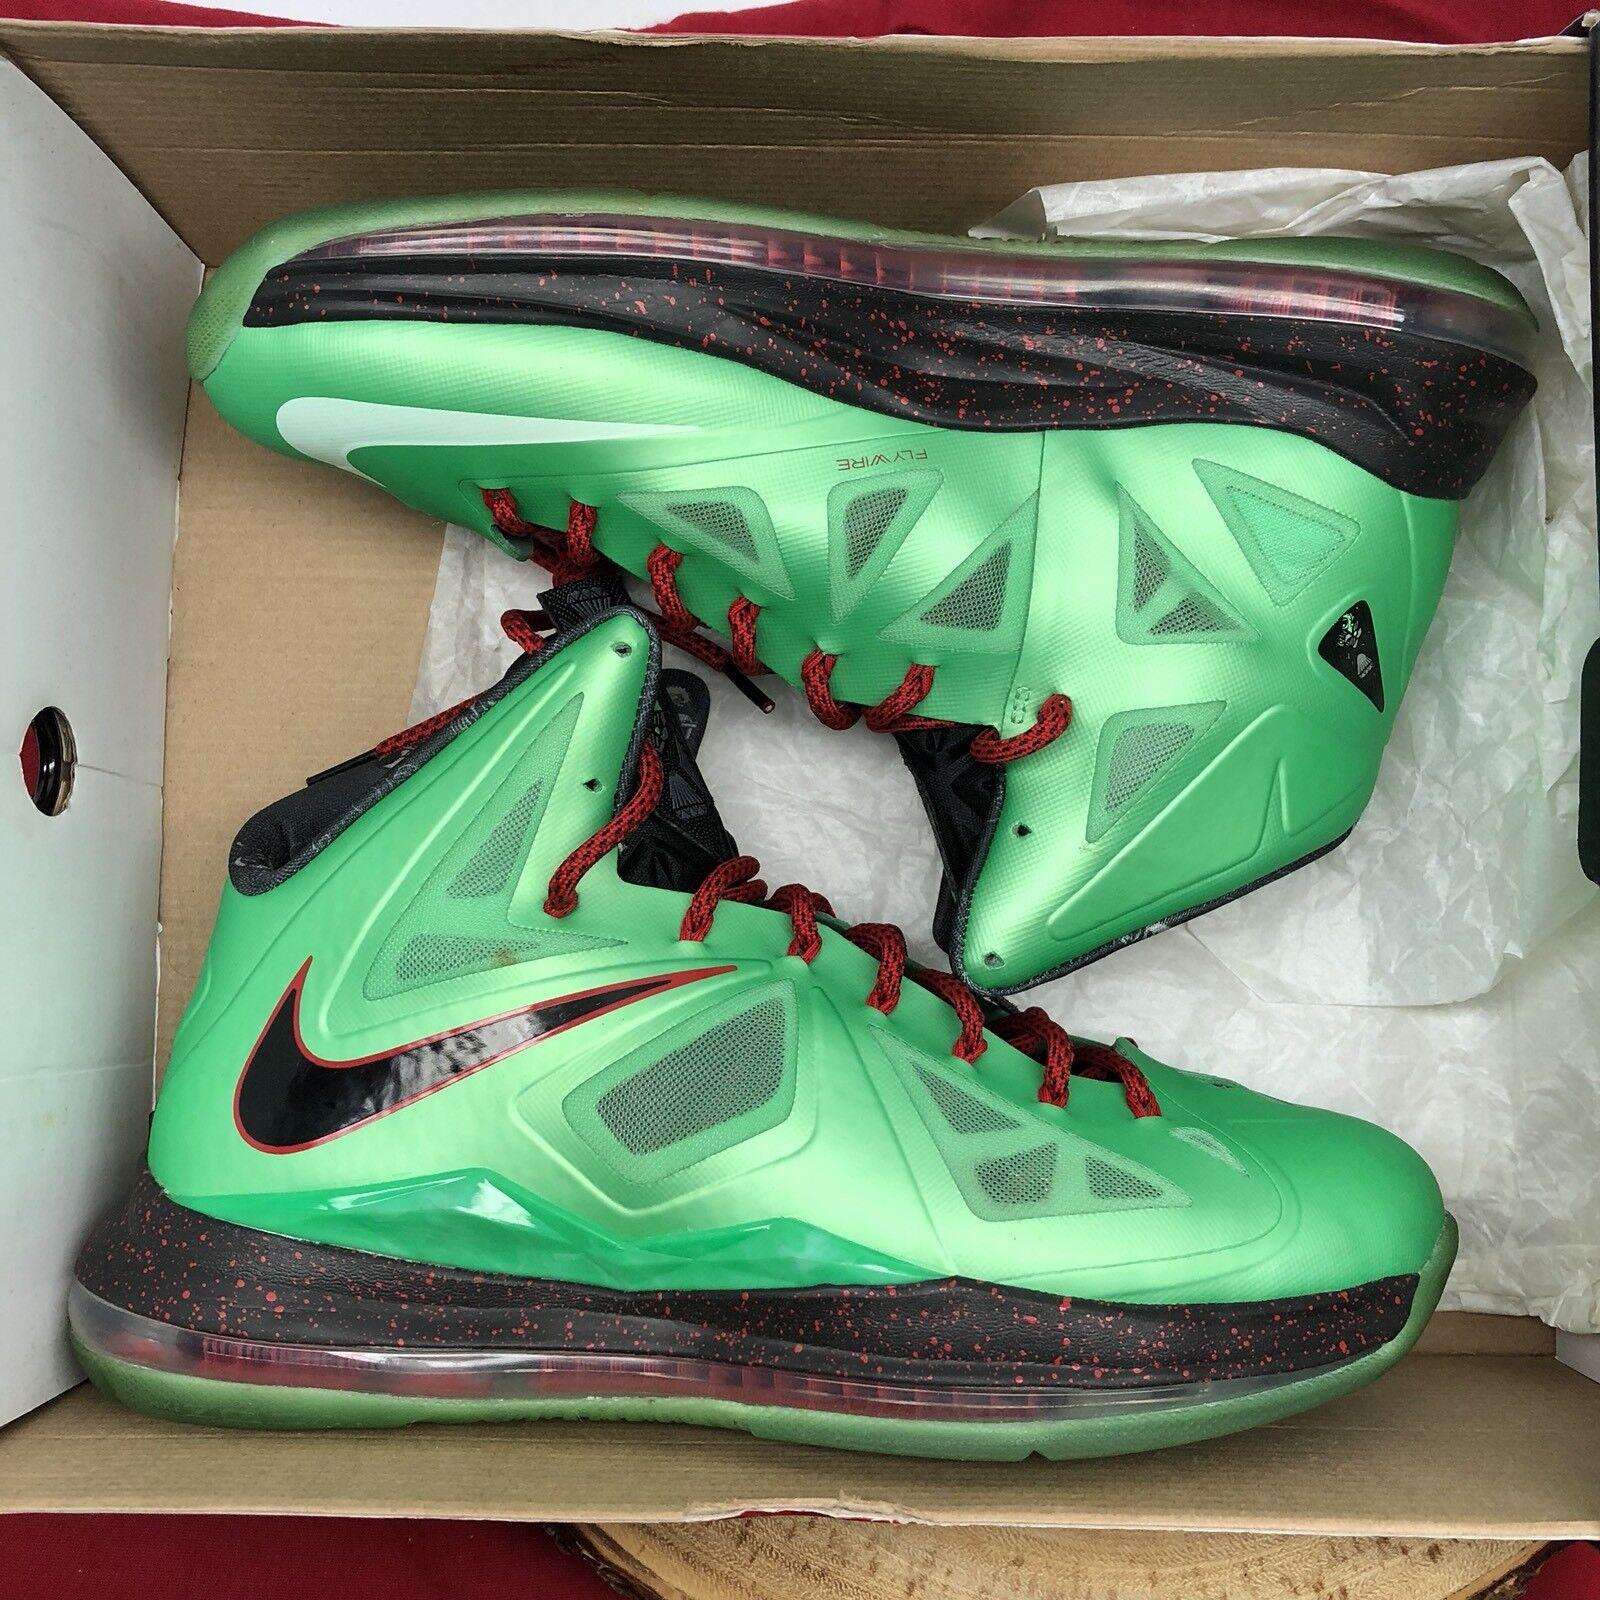 Nike Lebron X Cutting Jade Xmas 541100 303 Size Size Size 11 Green Jordan XI XII XIII XV 2 e035f3